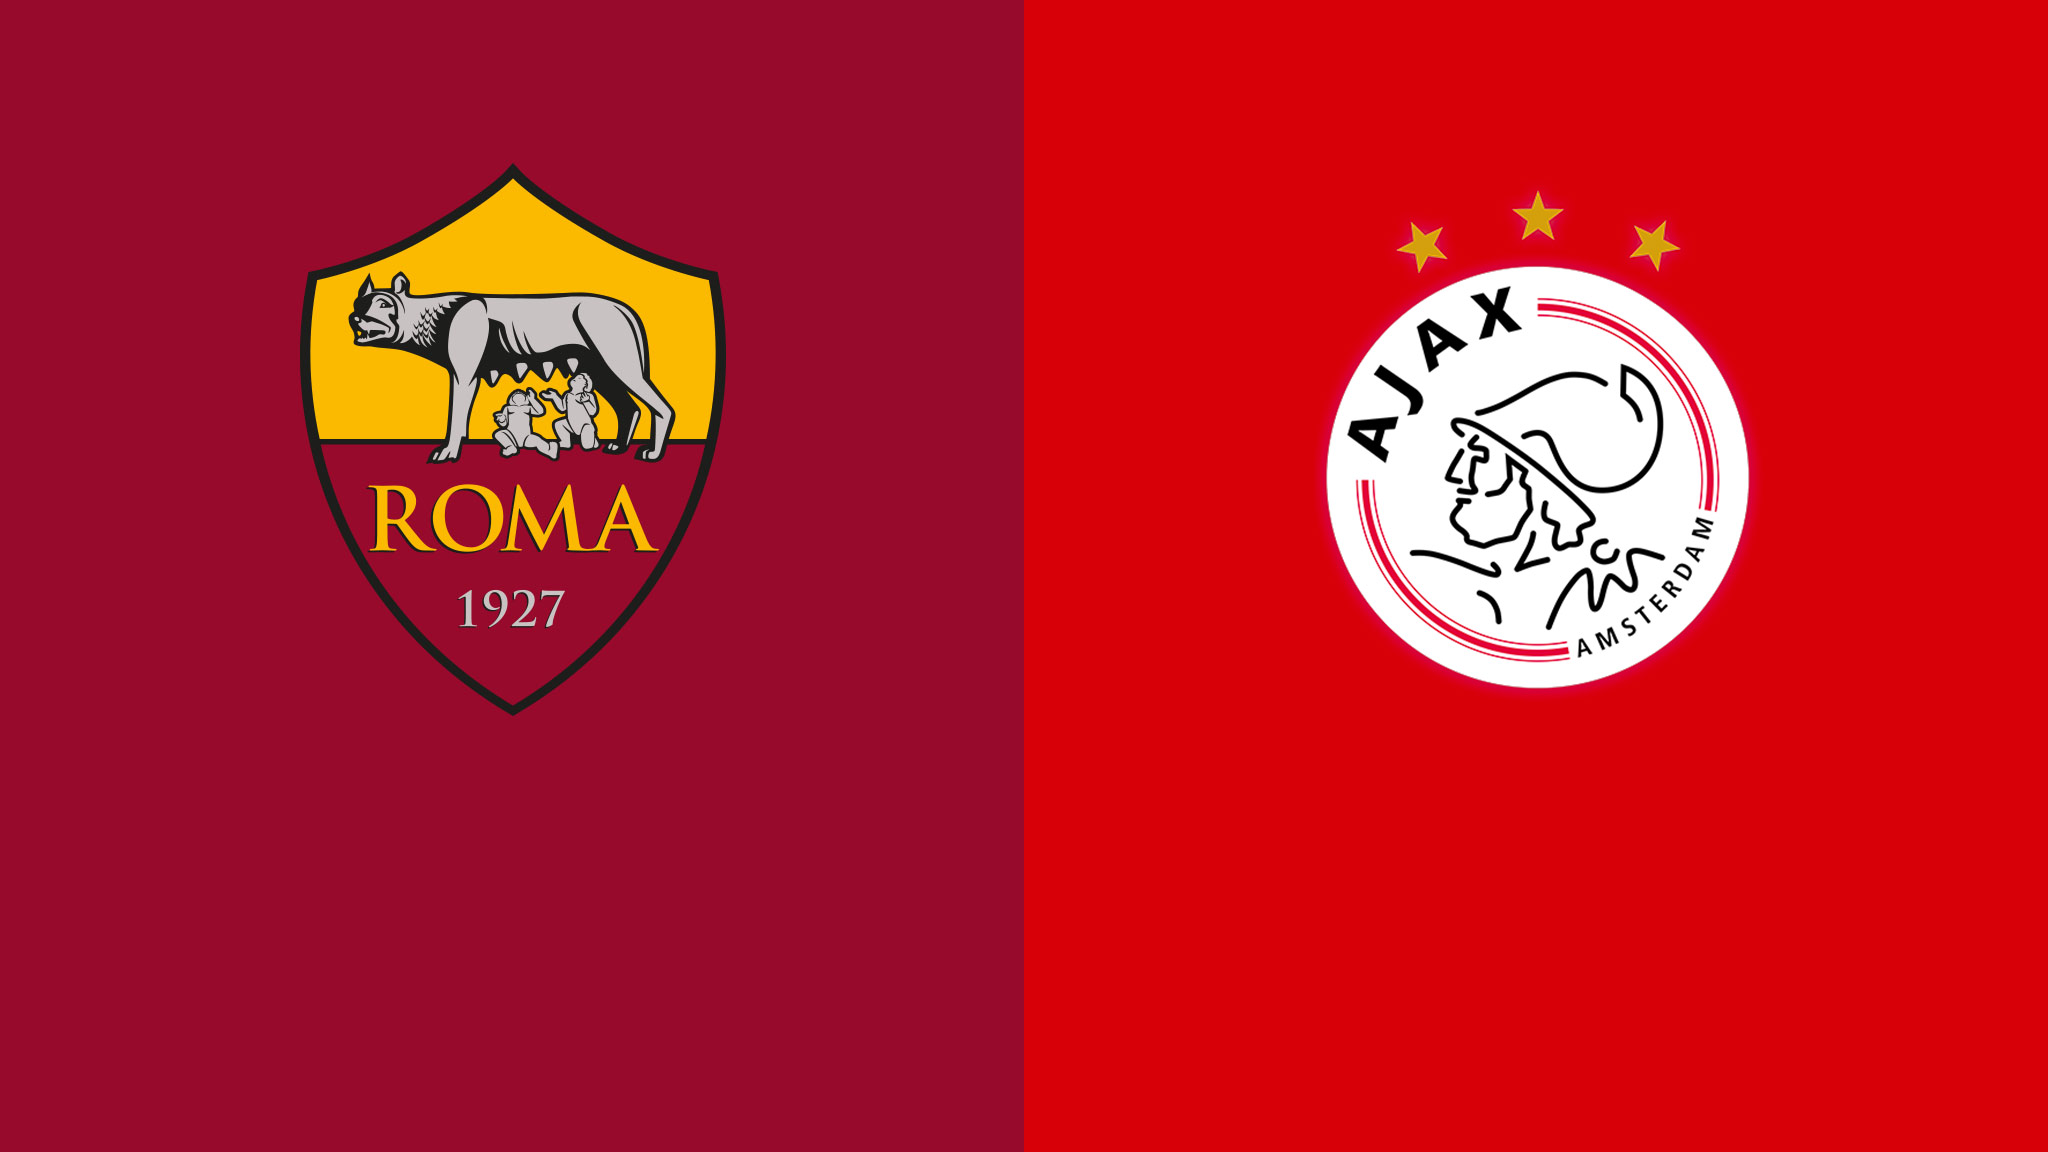 مشاهدة مباراة روما وأياكس أمستردام